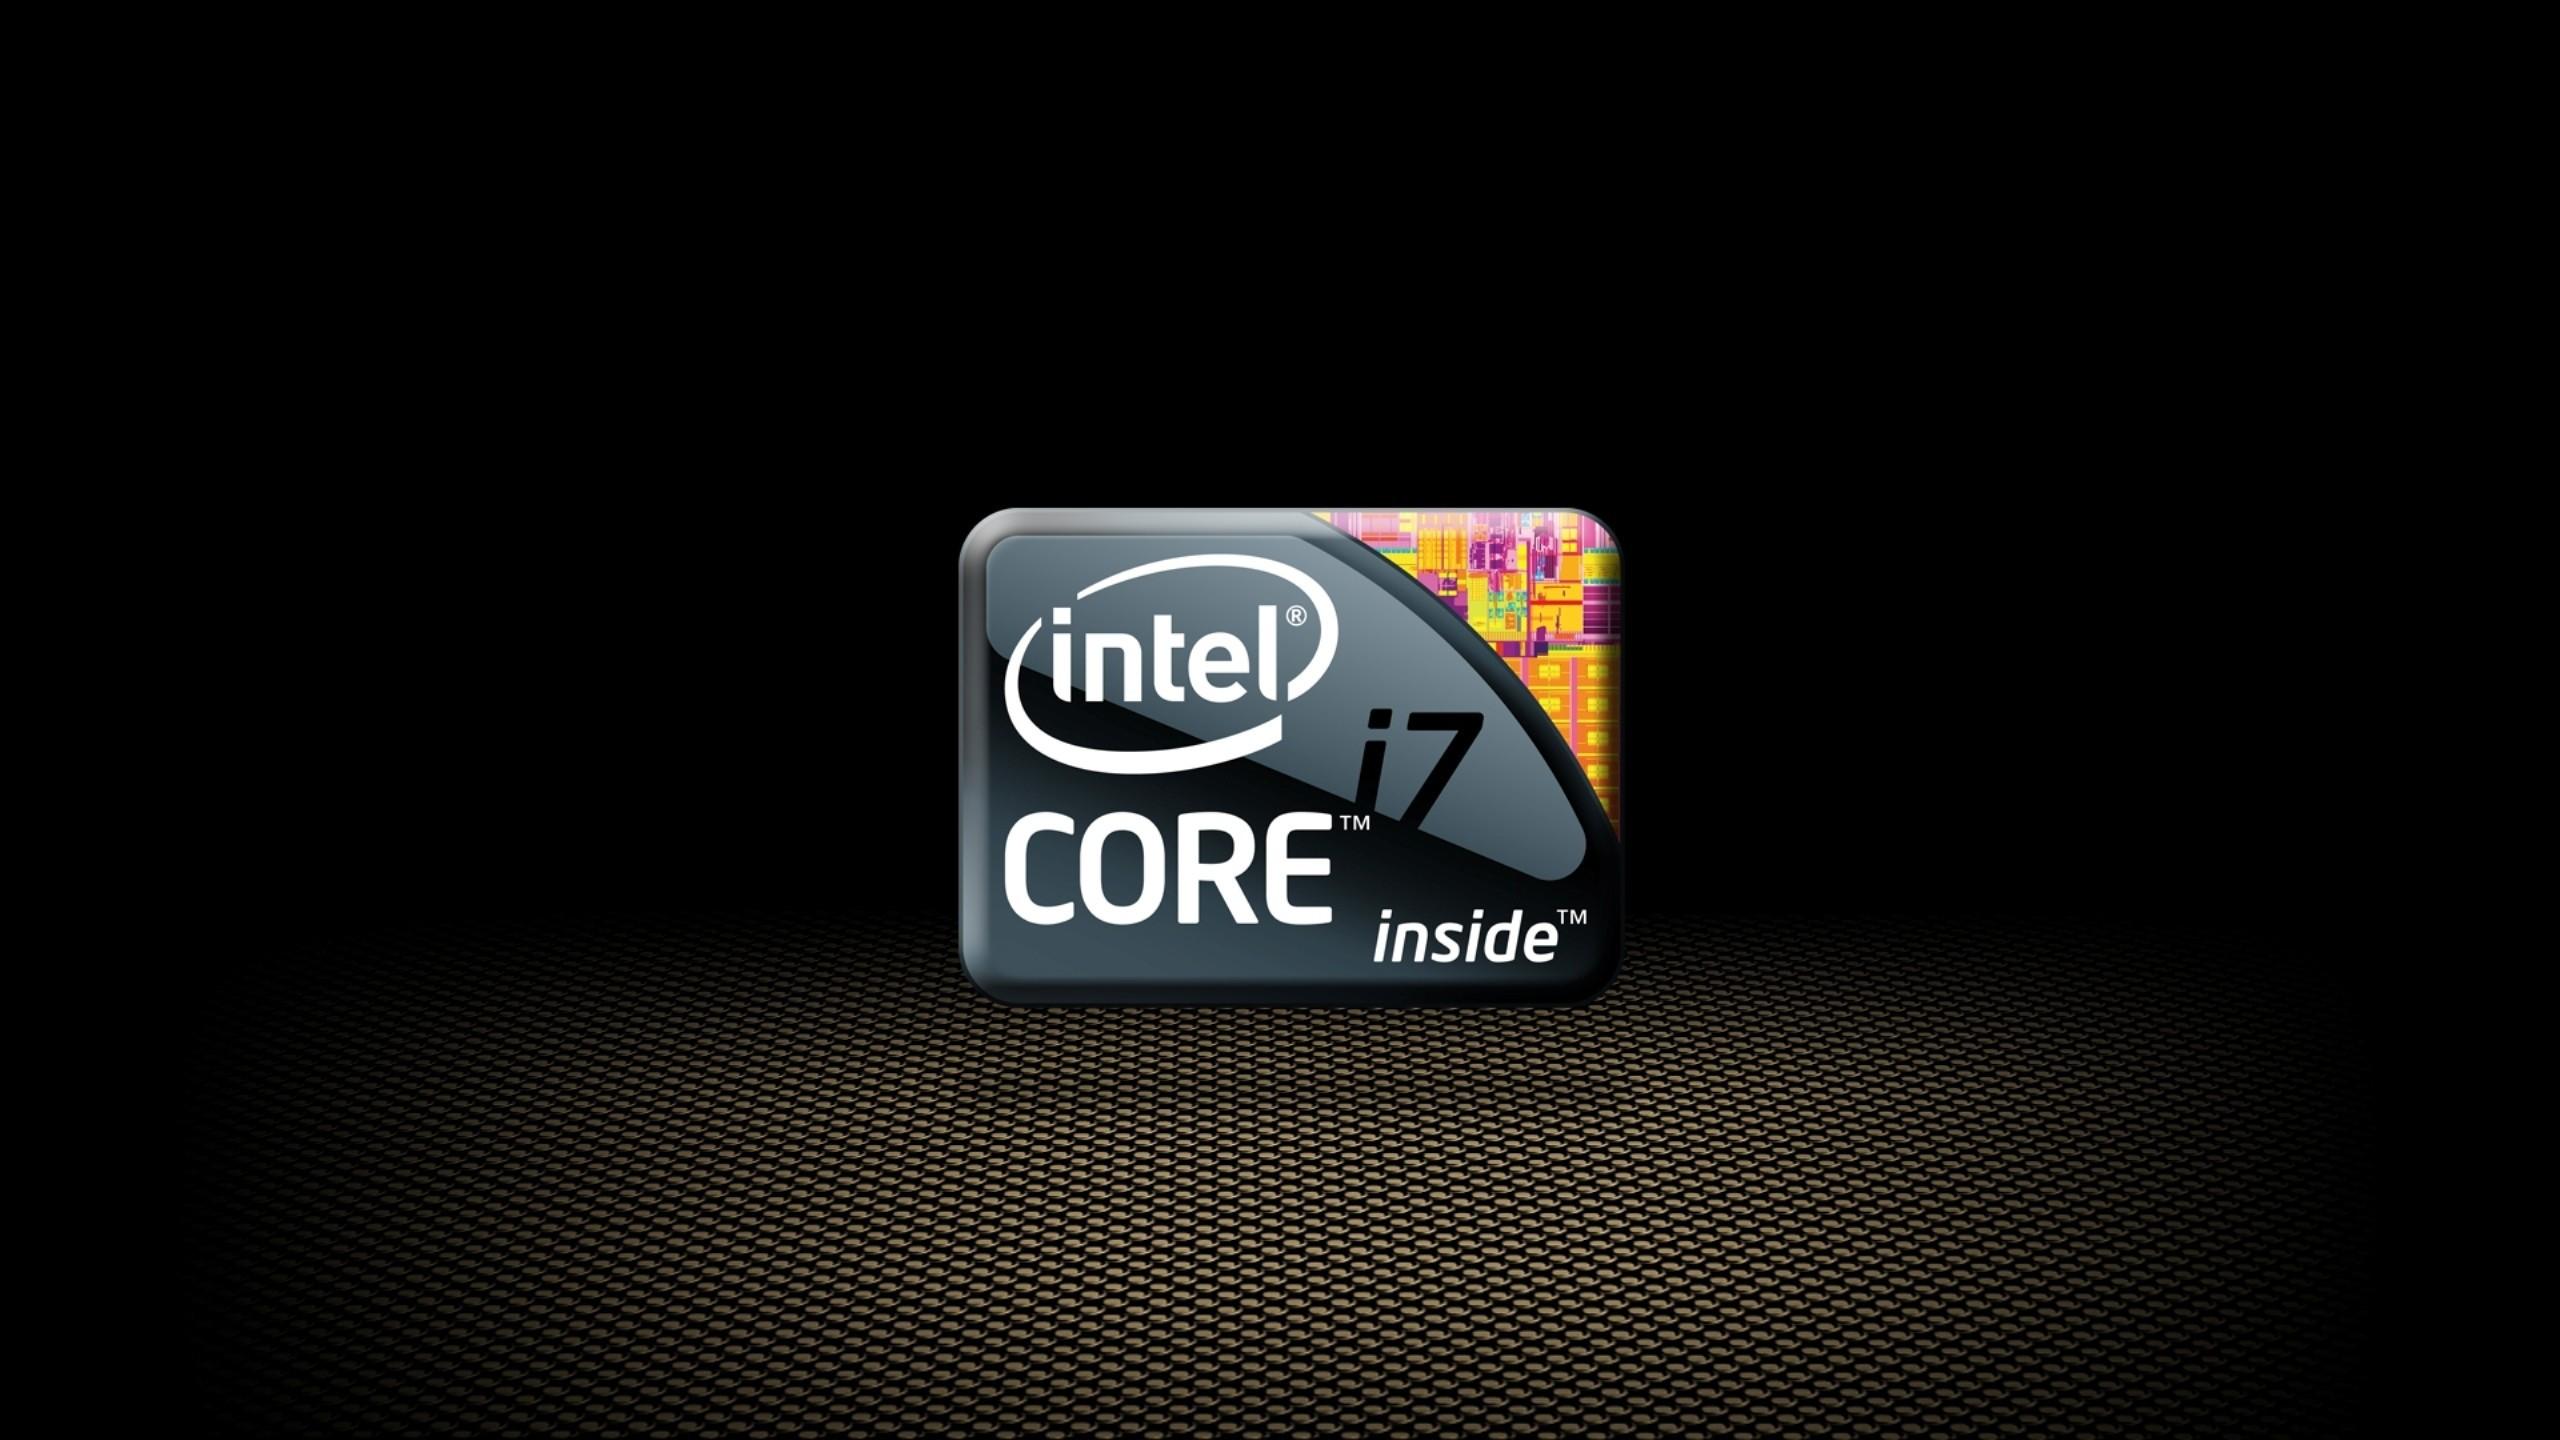 4th Generation Intel Core i7 Processors Product